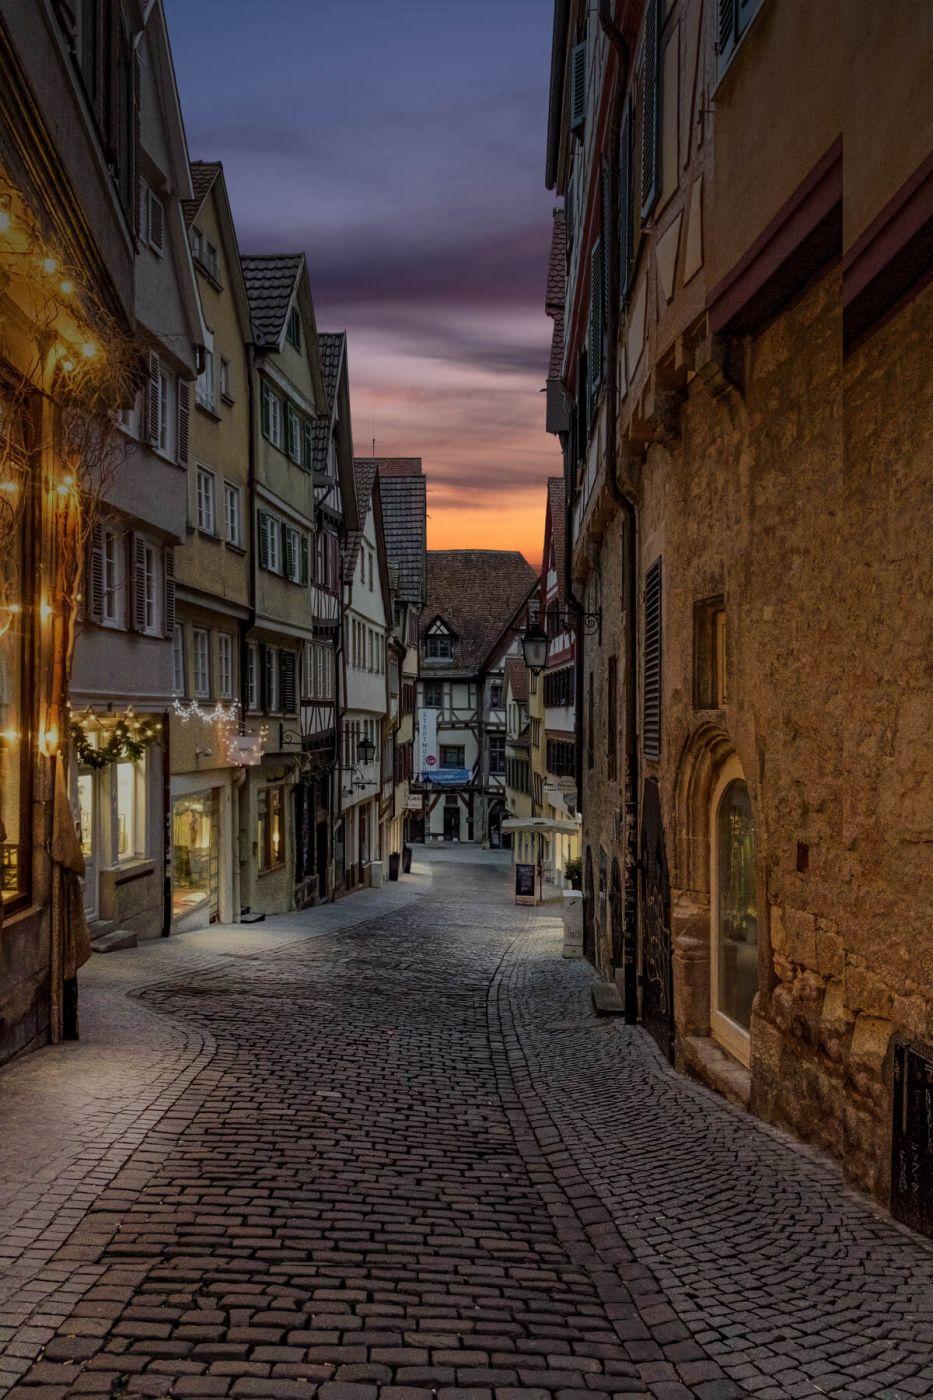 Marktgasse Tübingen, Germany